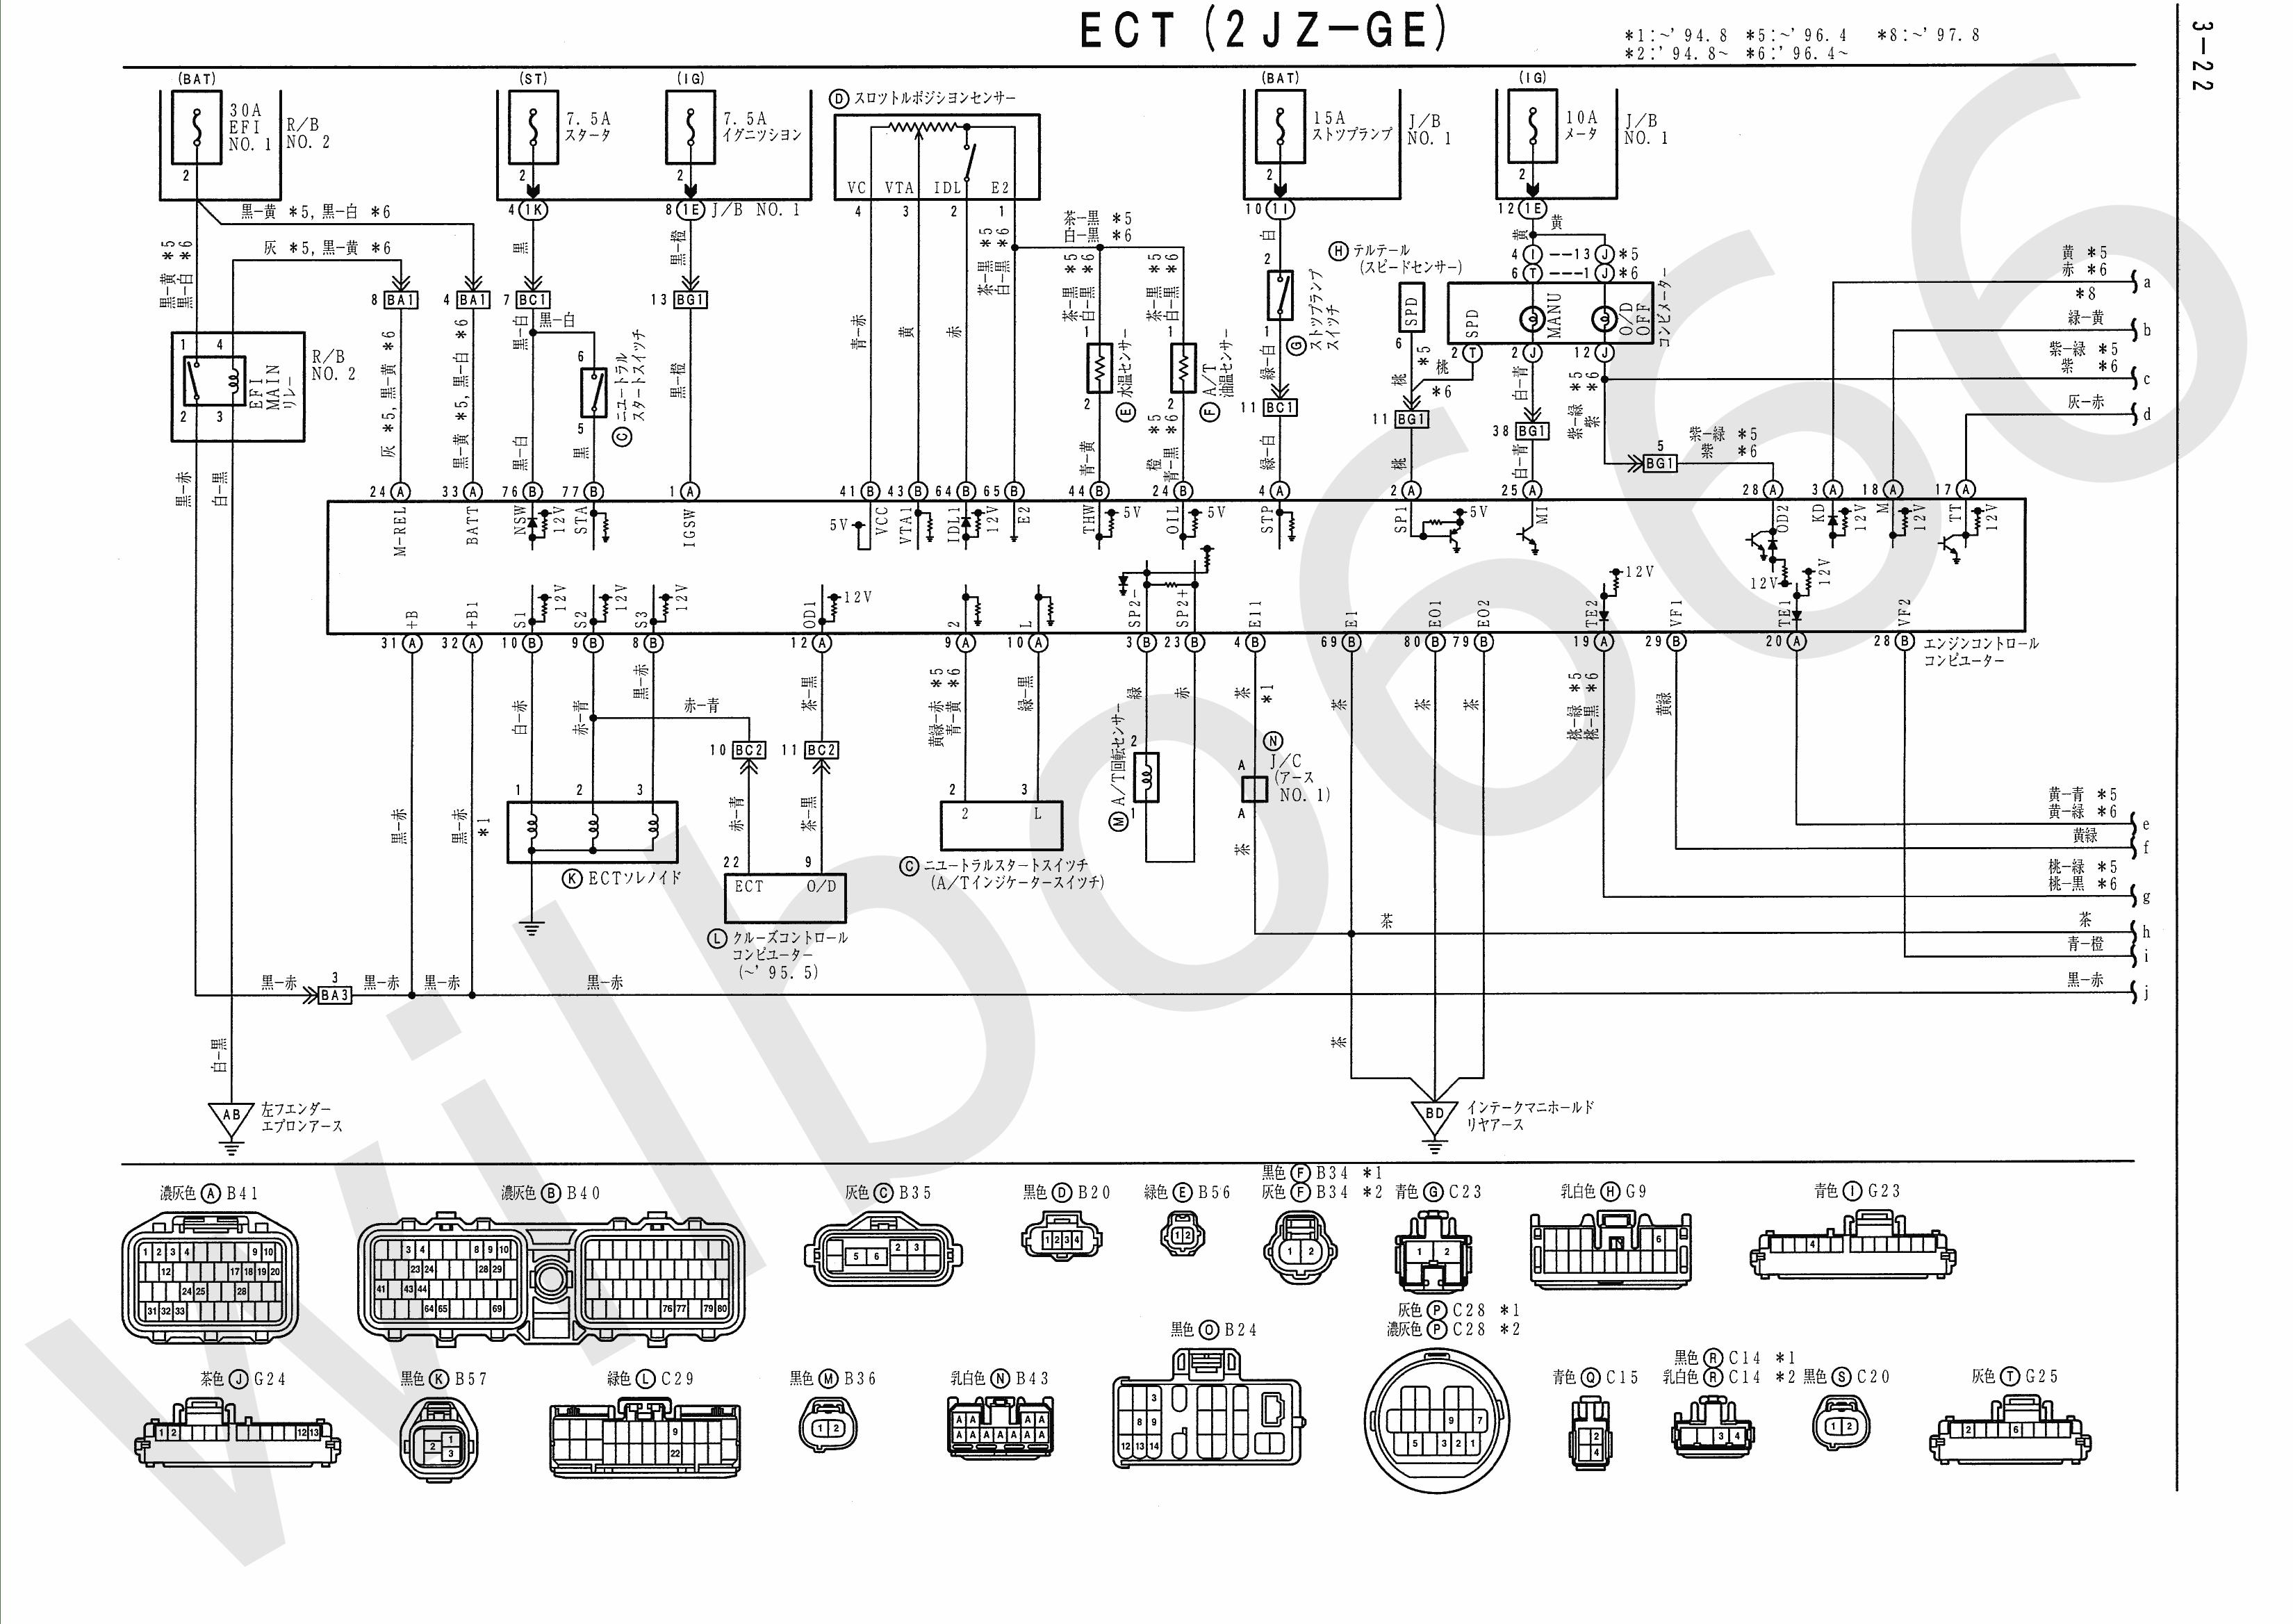 engine bay diagram sc300